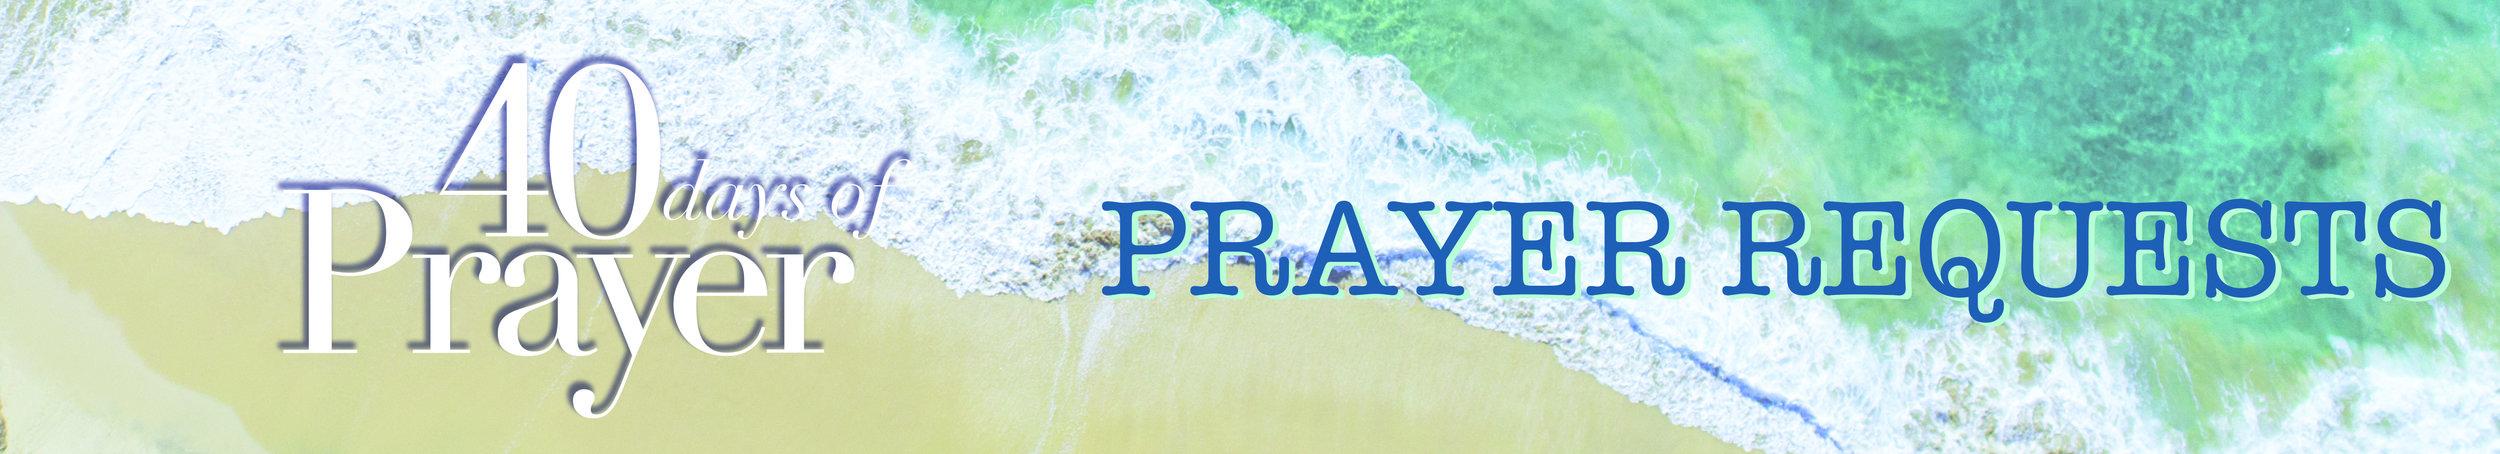 40DOP Long Image Prayer Requests.jpg